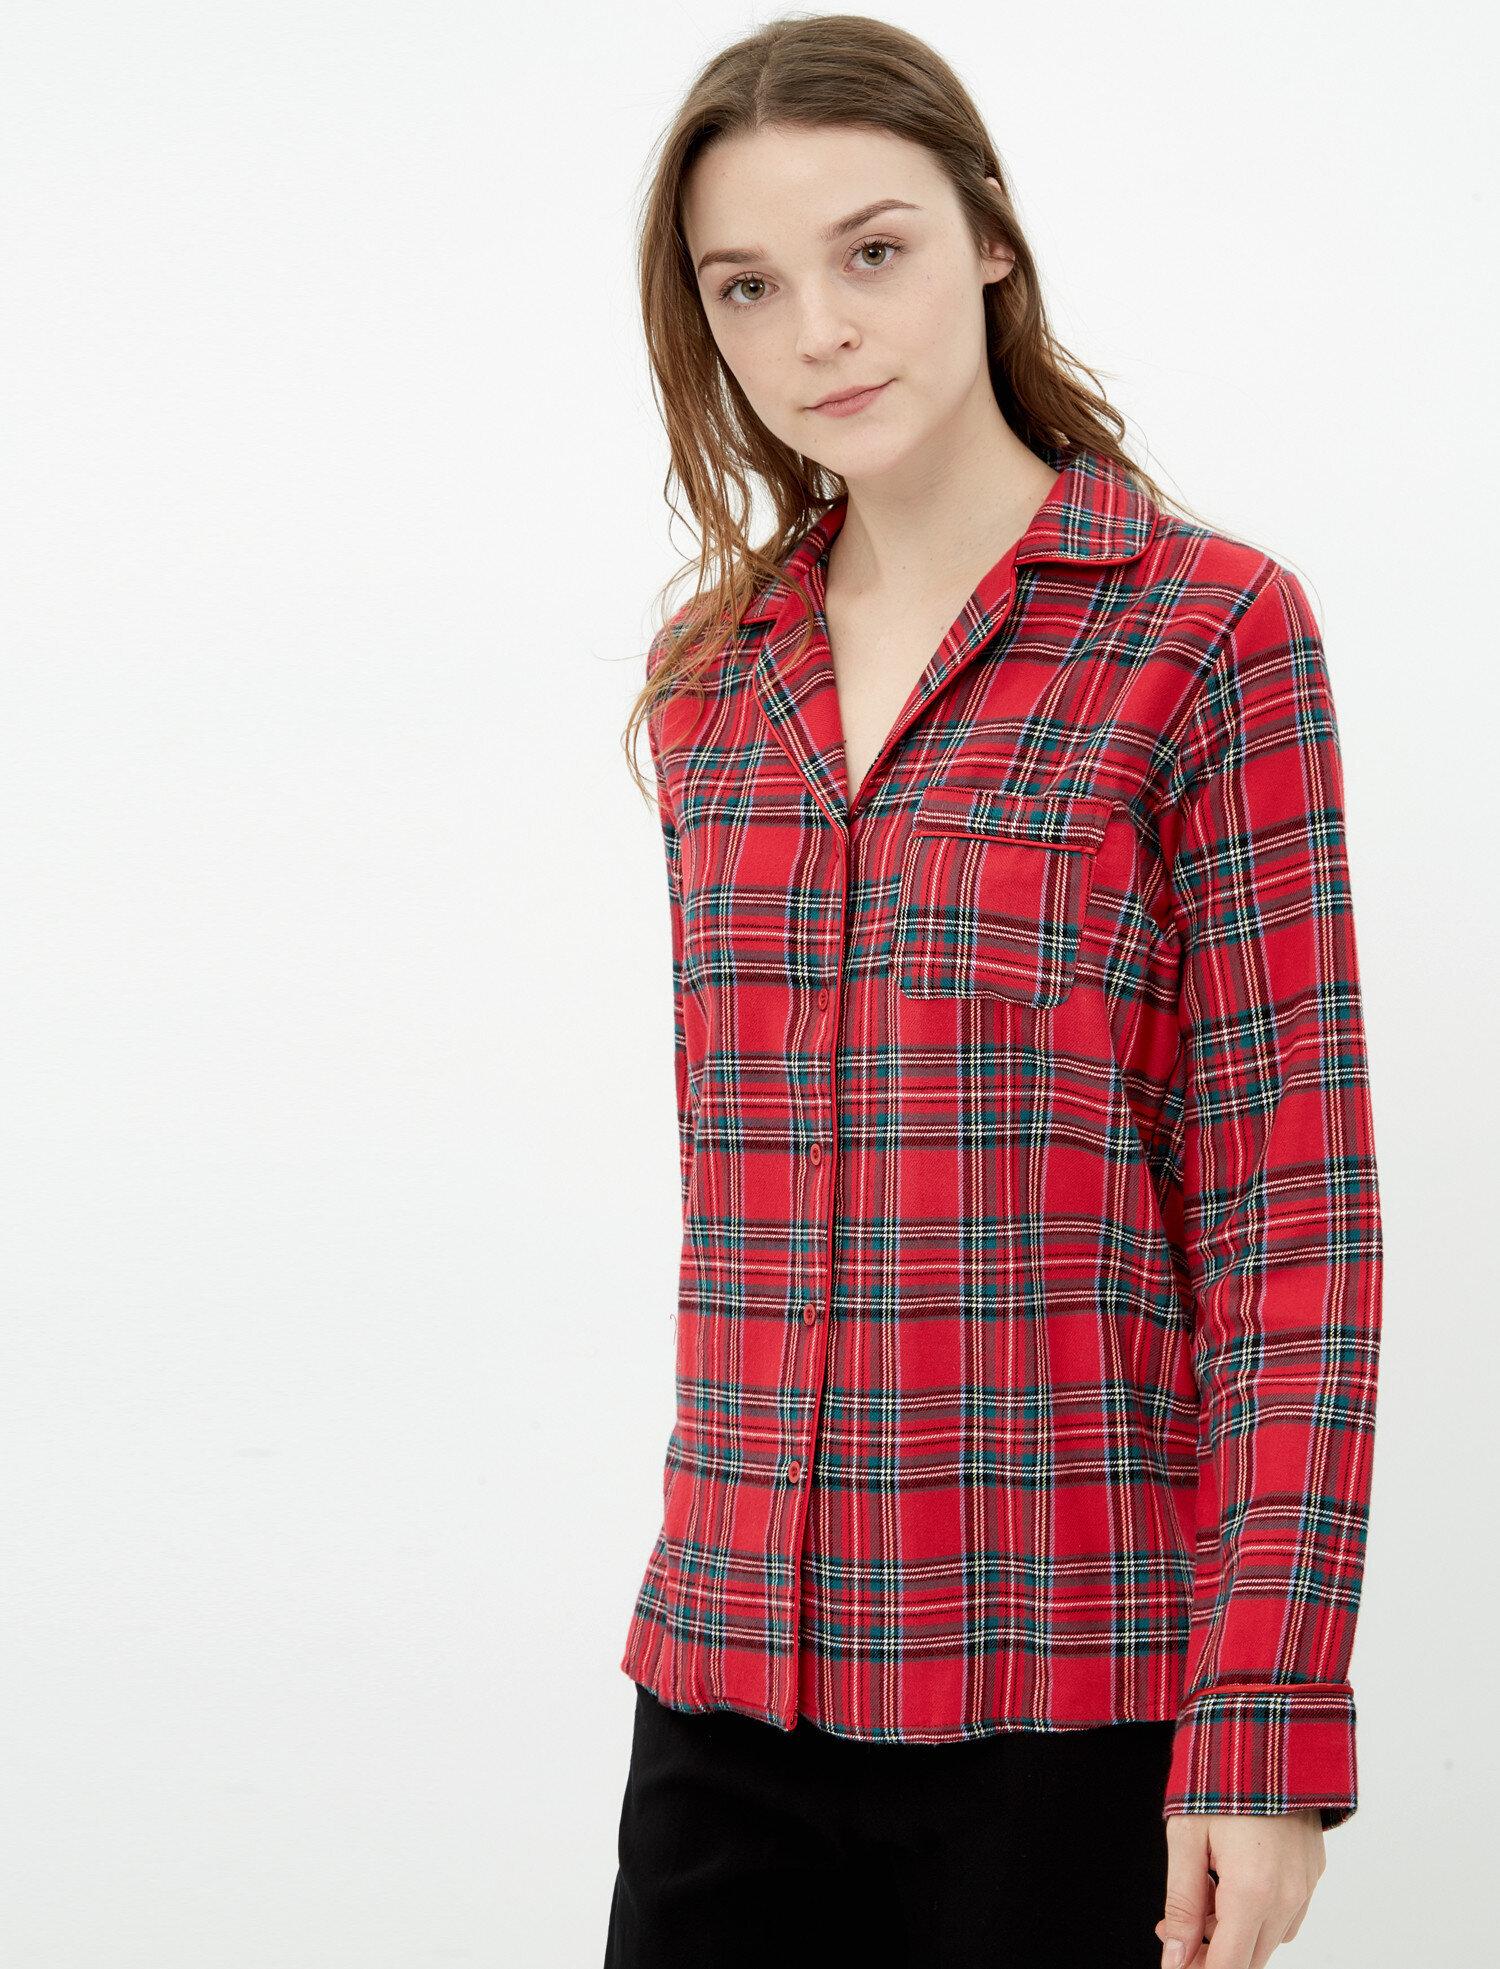 1b8aab96ab31f Kırmızı Bayan Kareli Pijama 7KLK73821OW12U | Koton